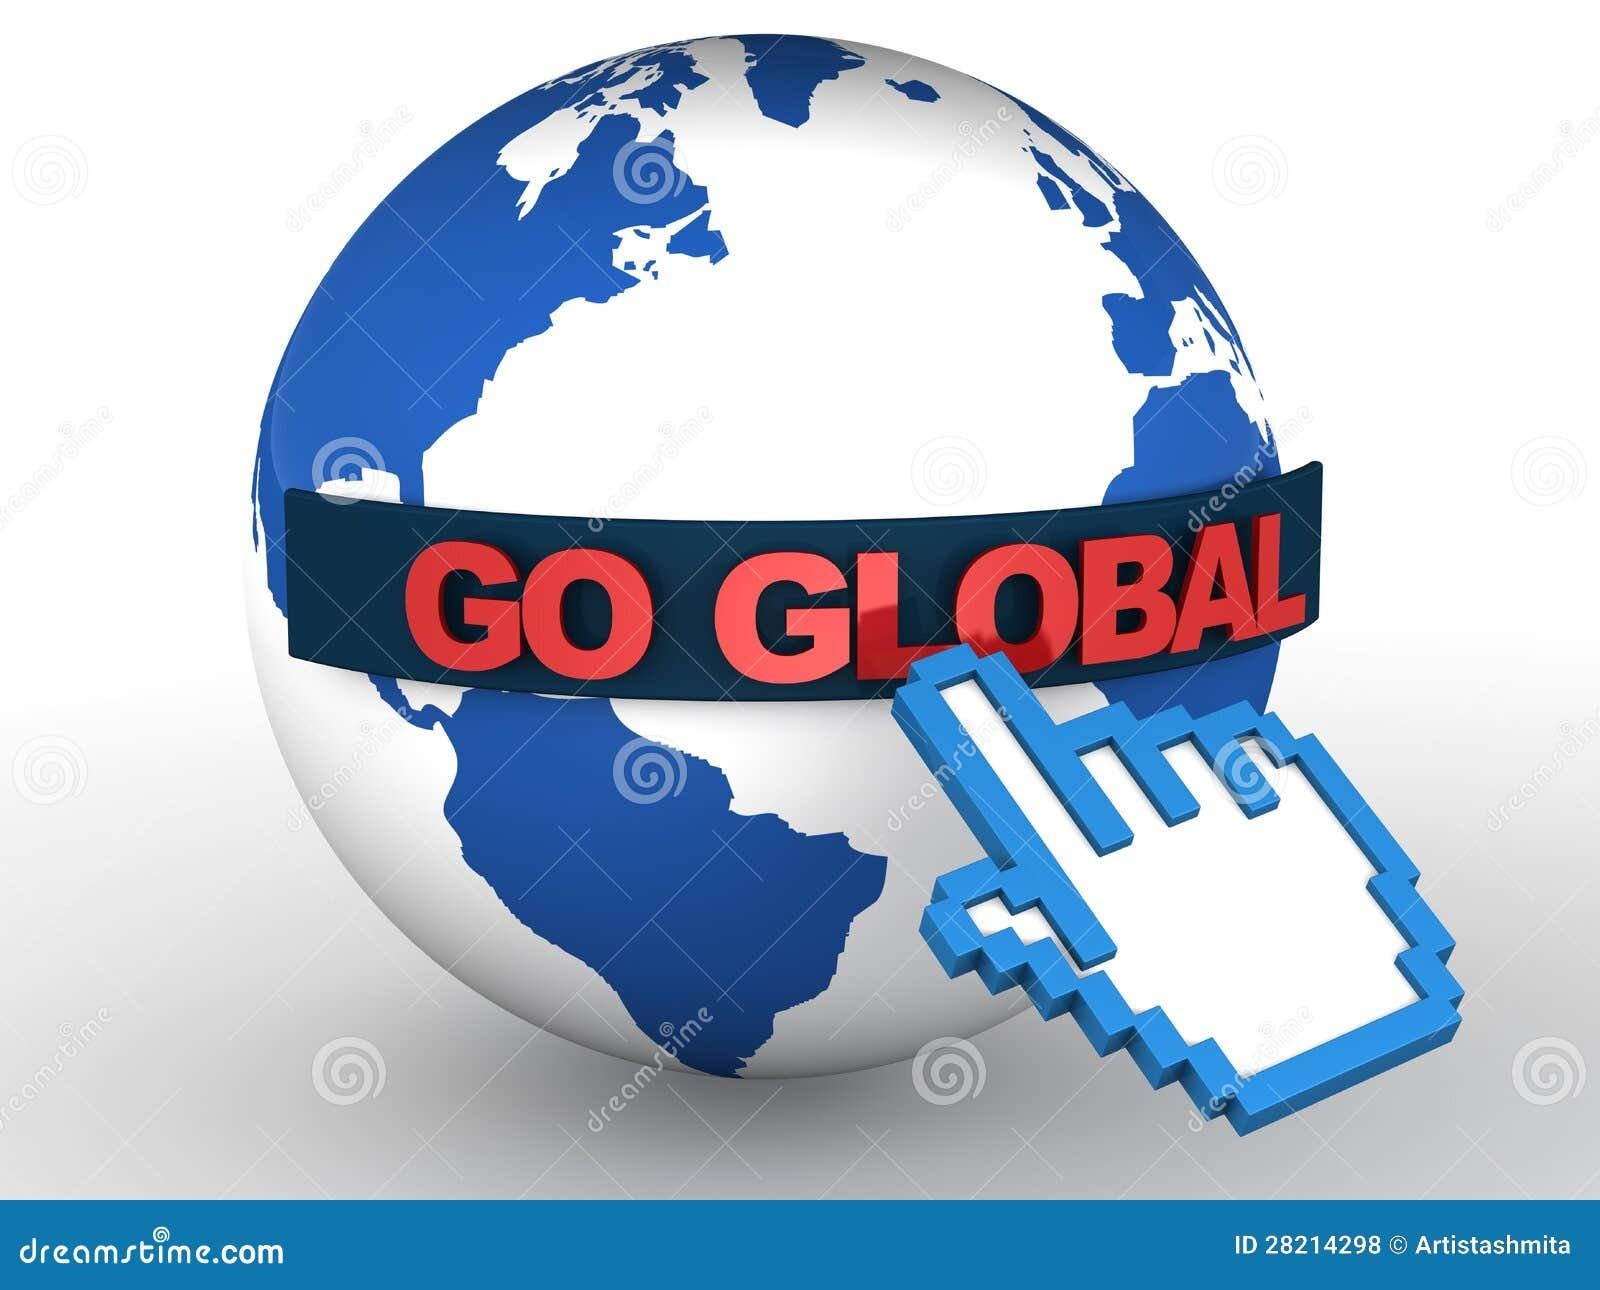 Allez global